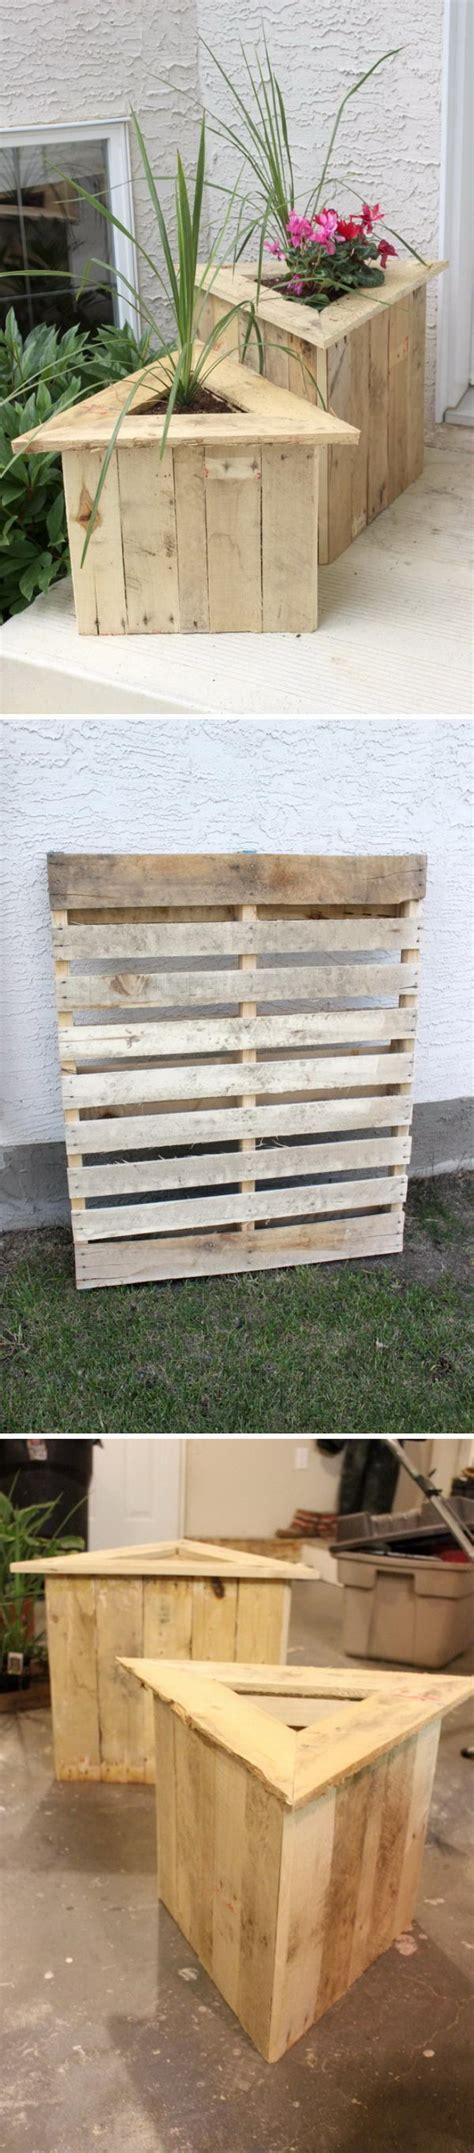 Ideas Using Pallets 15 diy garden planter ideas using wood pallets hative